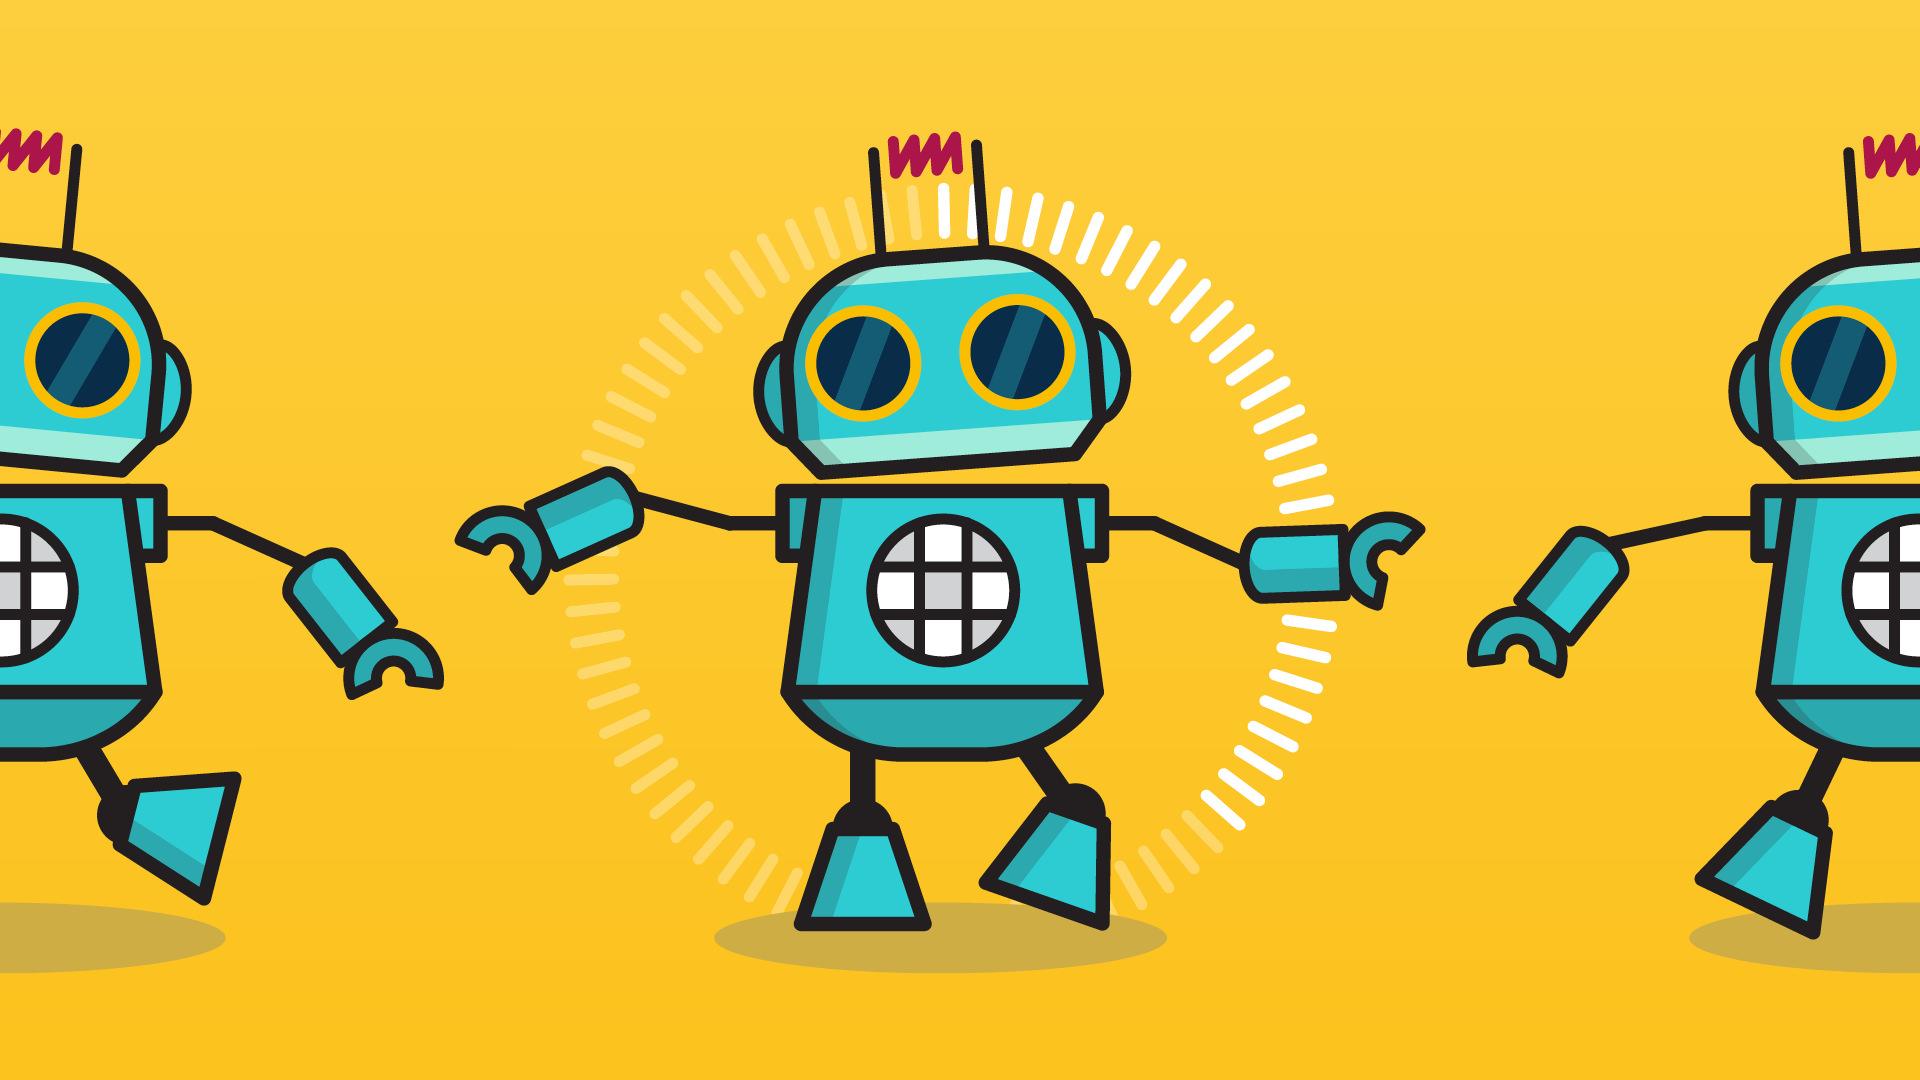 SurveyMonkey Dancing Robot Illustration